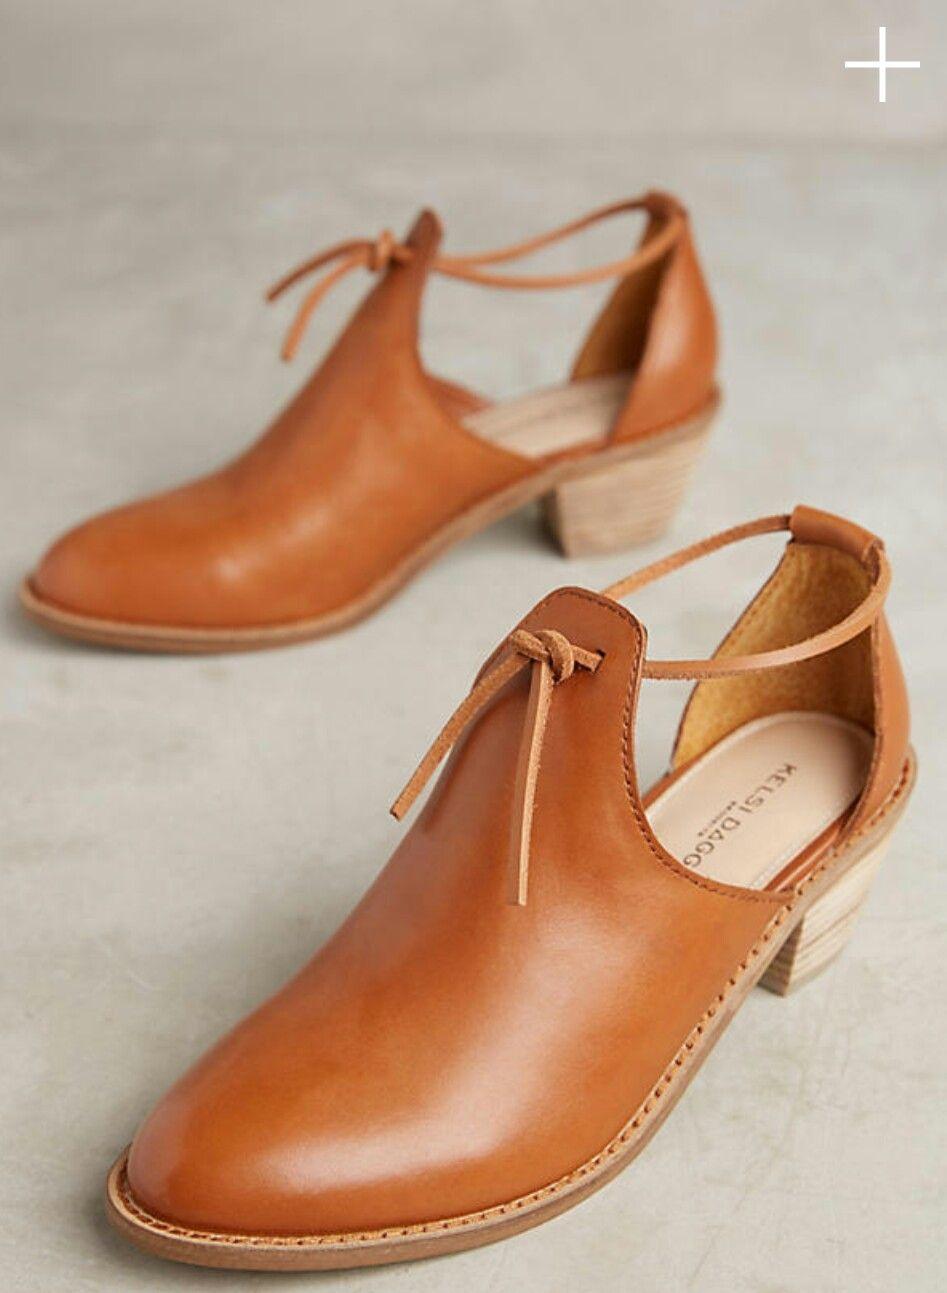 Zapatos beige formales Find para mujer Bg4KigZJyV